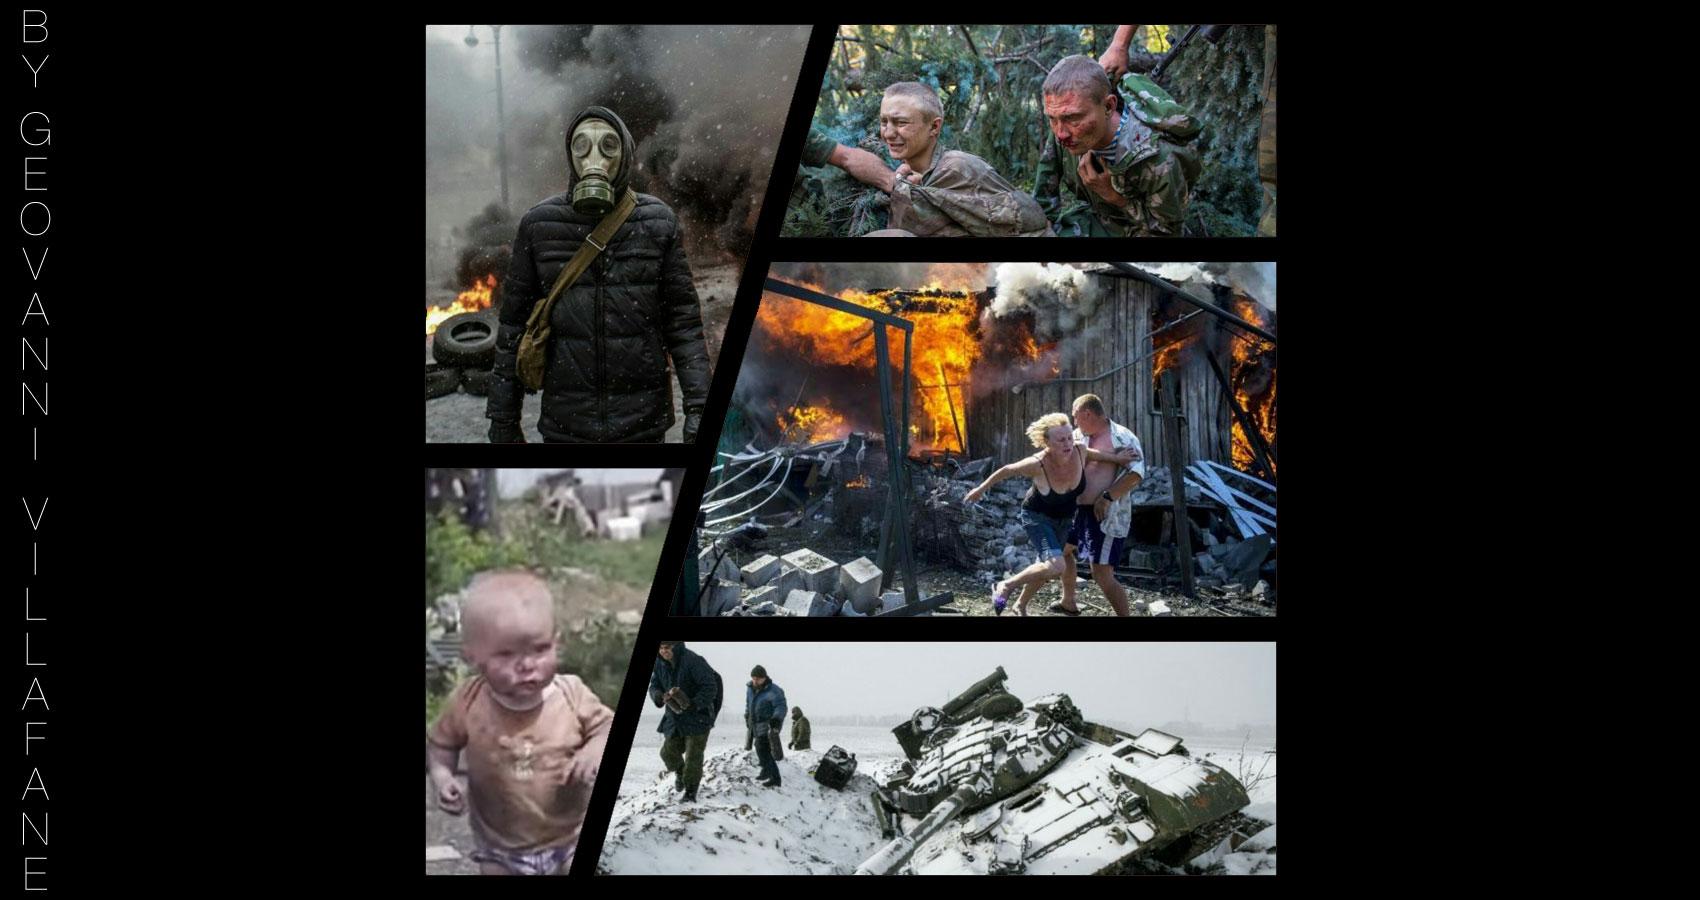 Ukraine's Dismay by Geovanni Villafañe at Spillwords.com